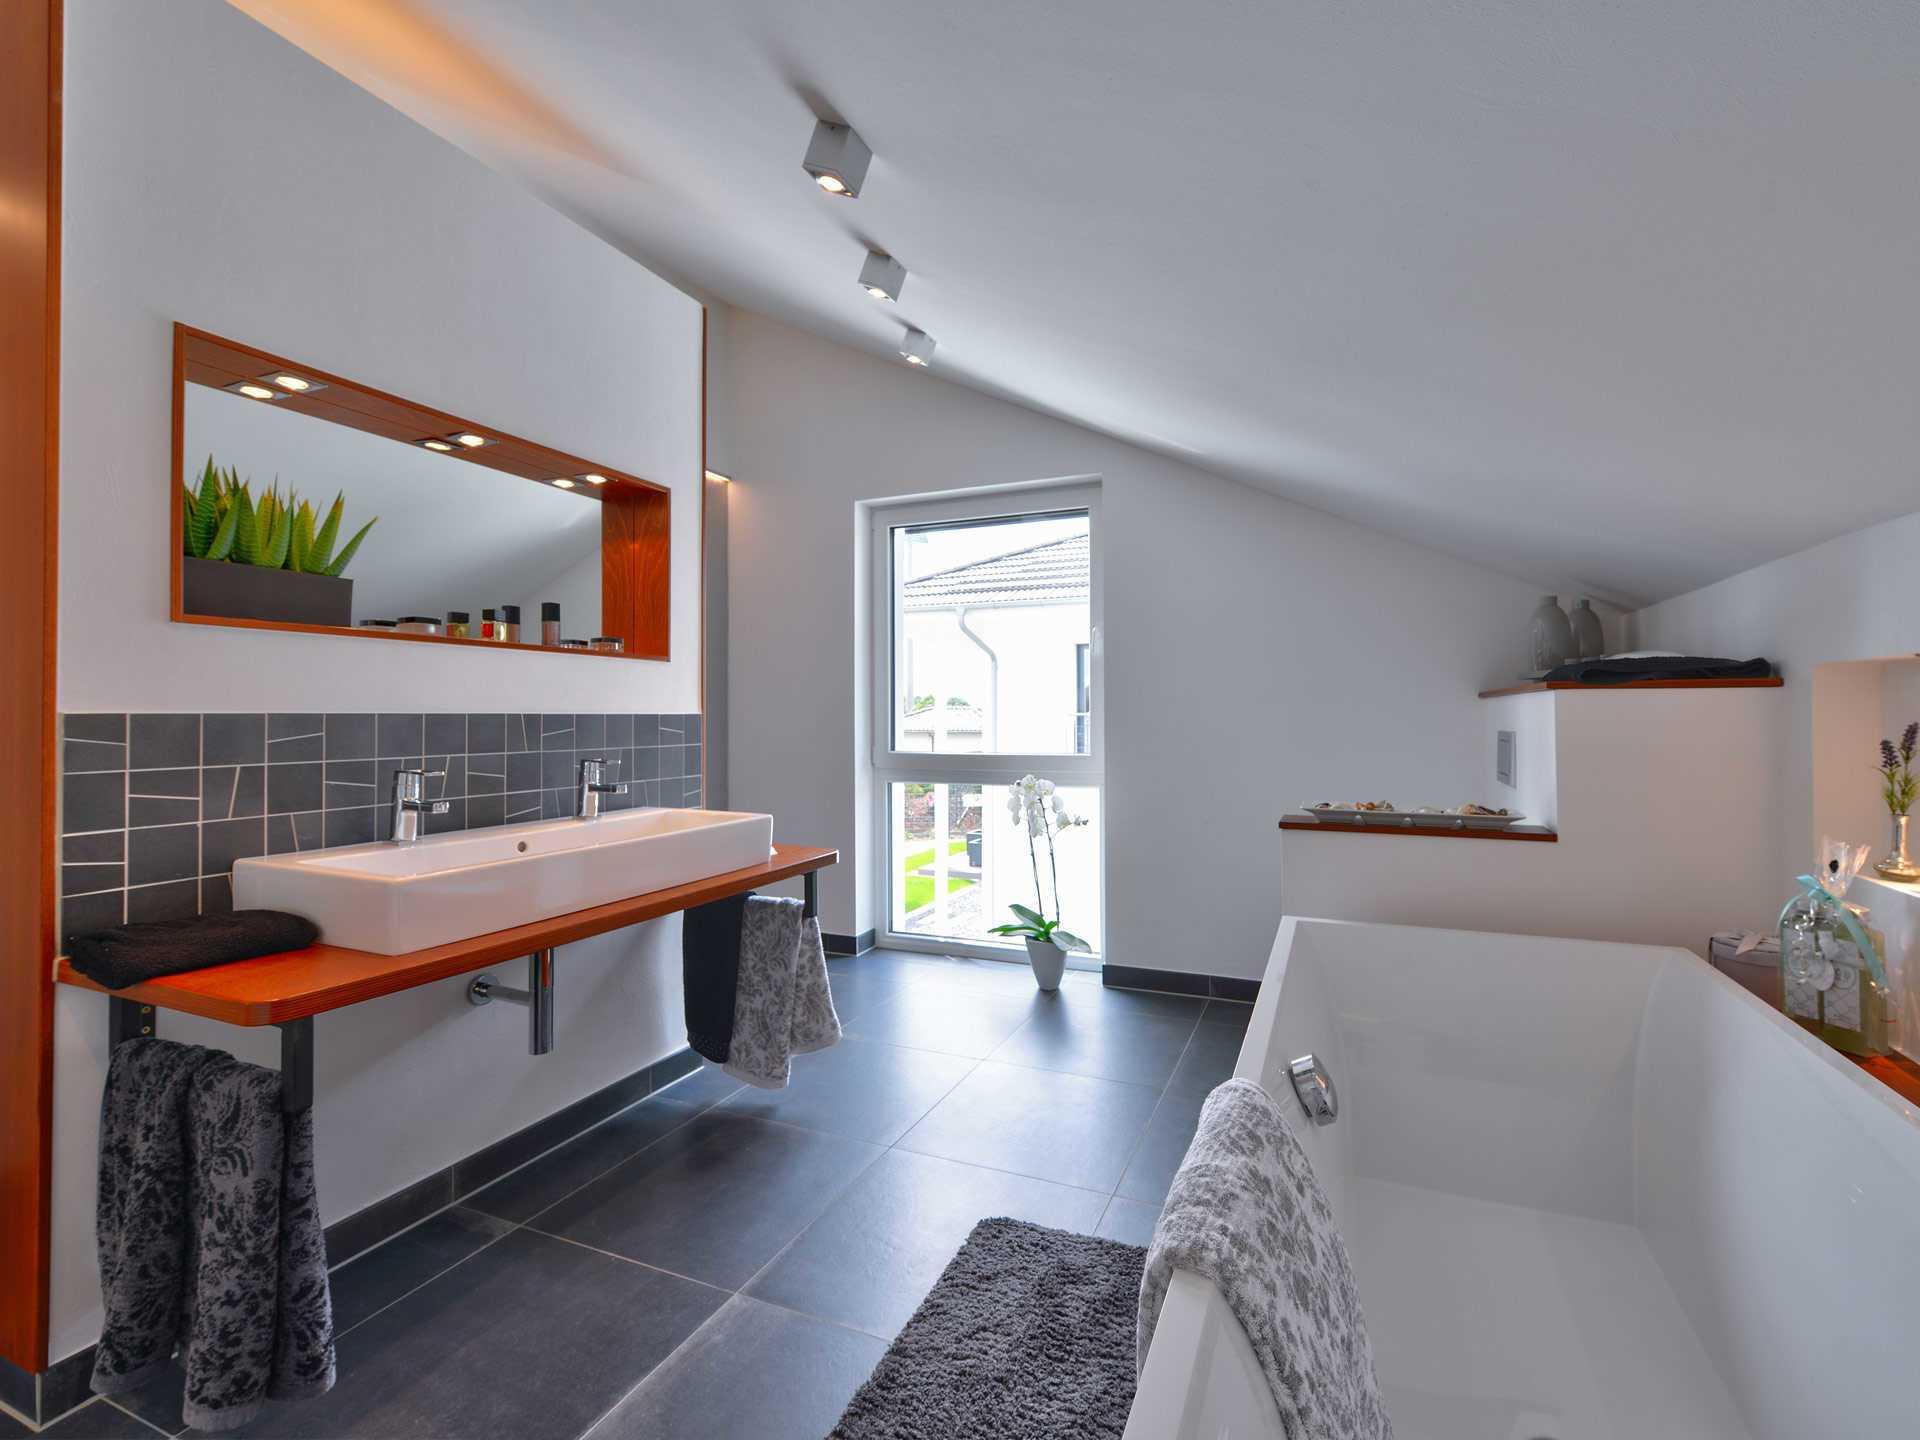 Musterhaus Wuppertal Partner Haus Partner Haus Musterhaus Net